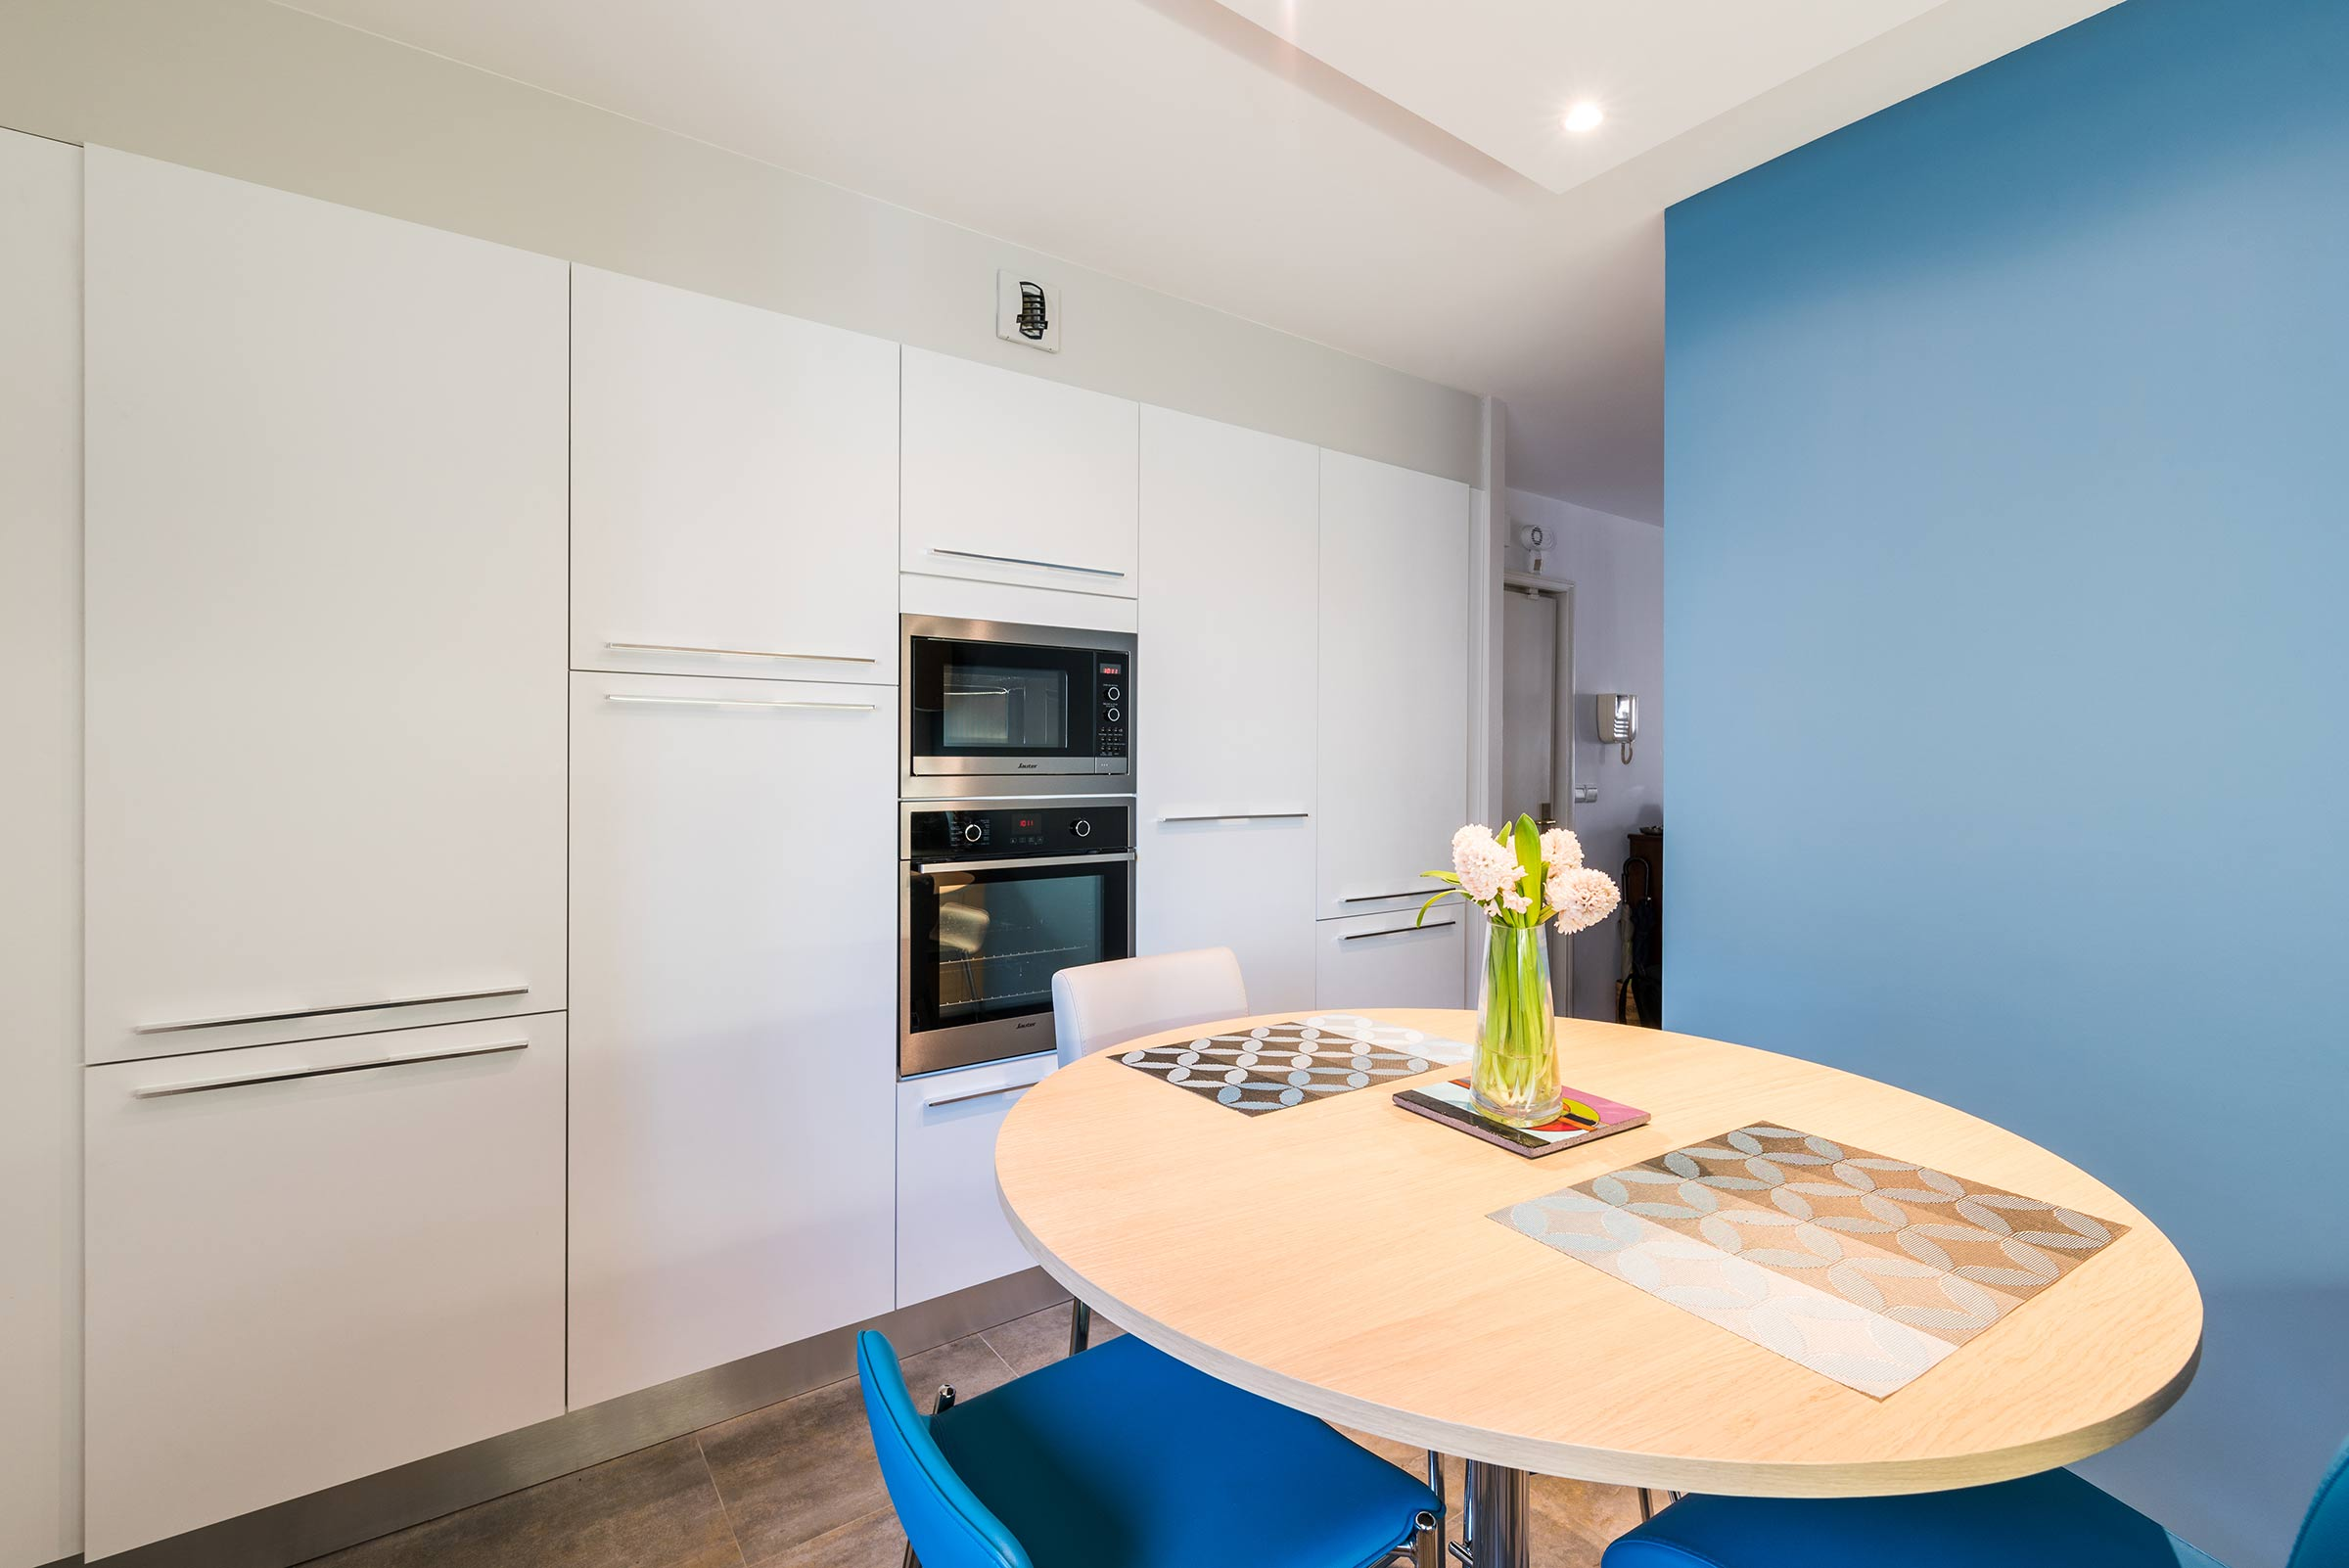 renovation cuisine lyon cool renovation d une cuisine lyon with renovation cuisine lyon free. Black Bedroom Furniture Sets. Home Design Ideas